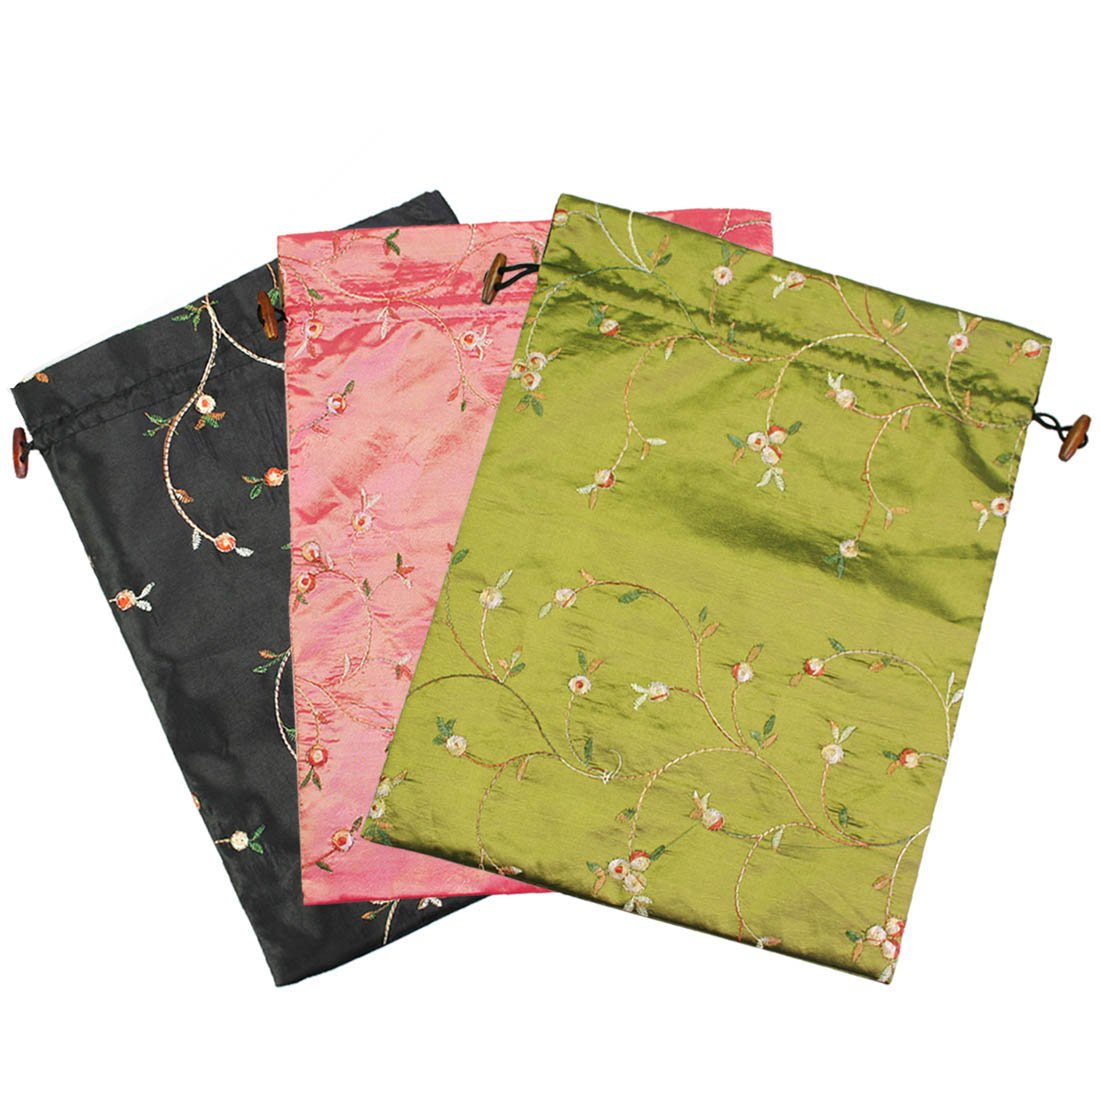 kilofly Embroidered Silk Jacquard Travel Bag, Lingerie & Shoes, Value Set of 3